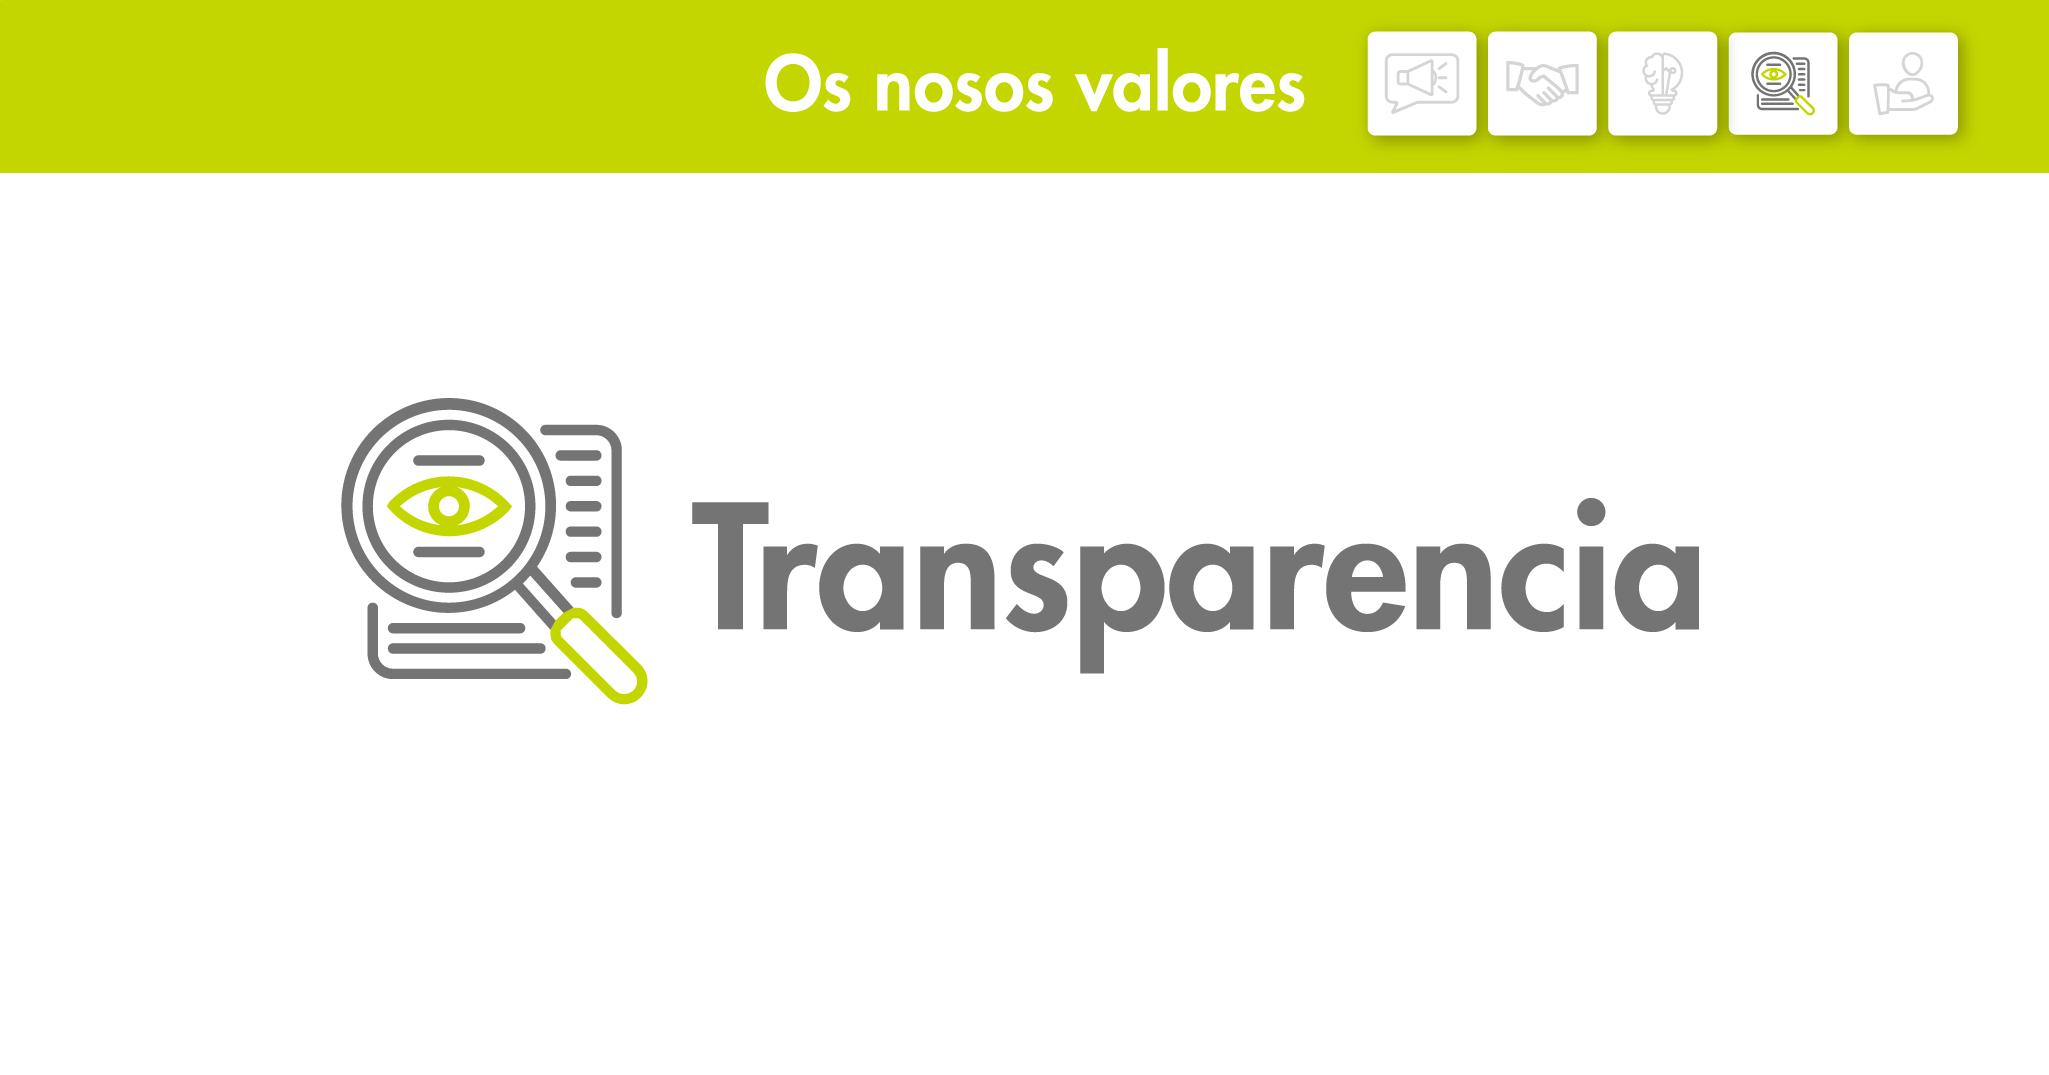 Os nosos valores: Transparencia